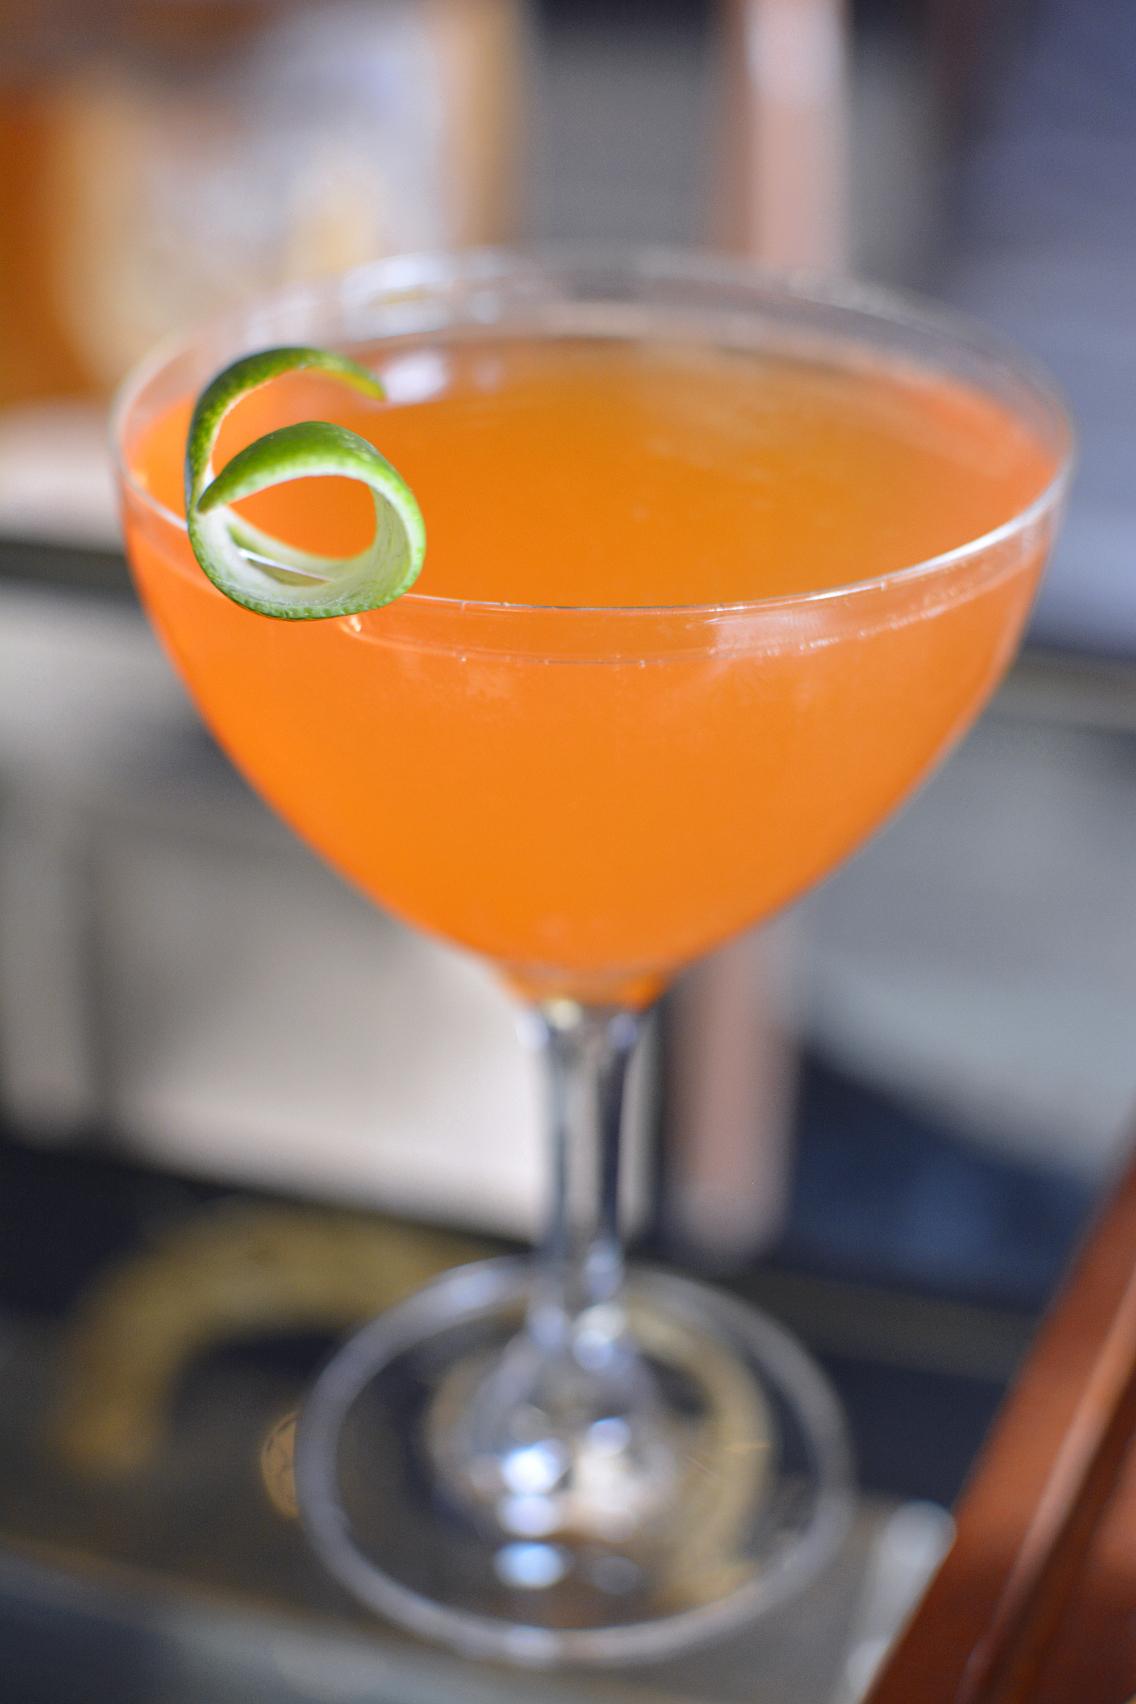 Presidio Chicago Municipal Code Cocktail